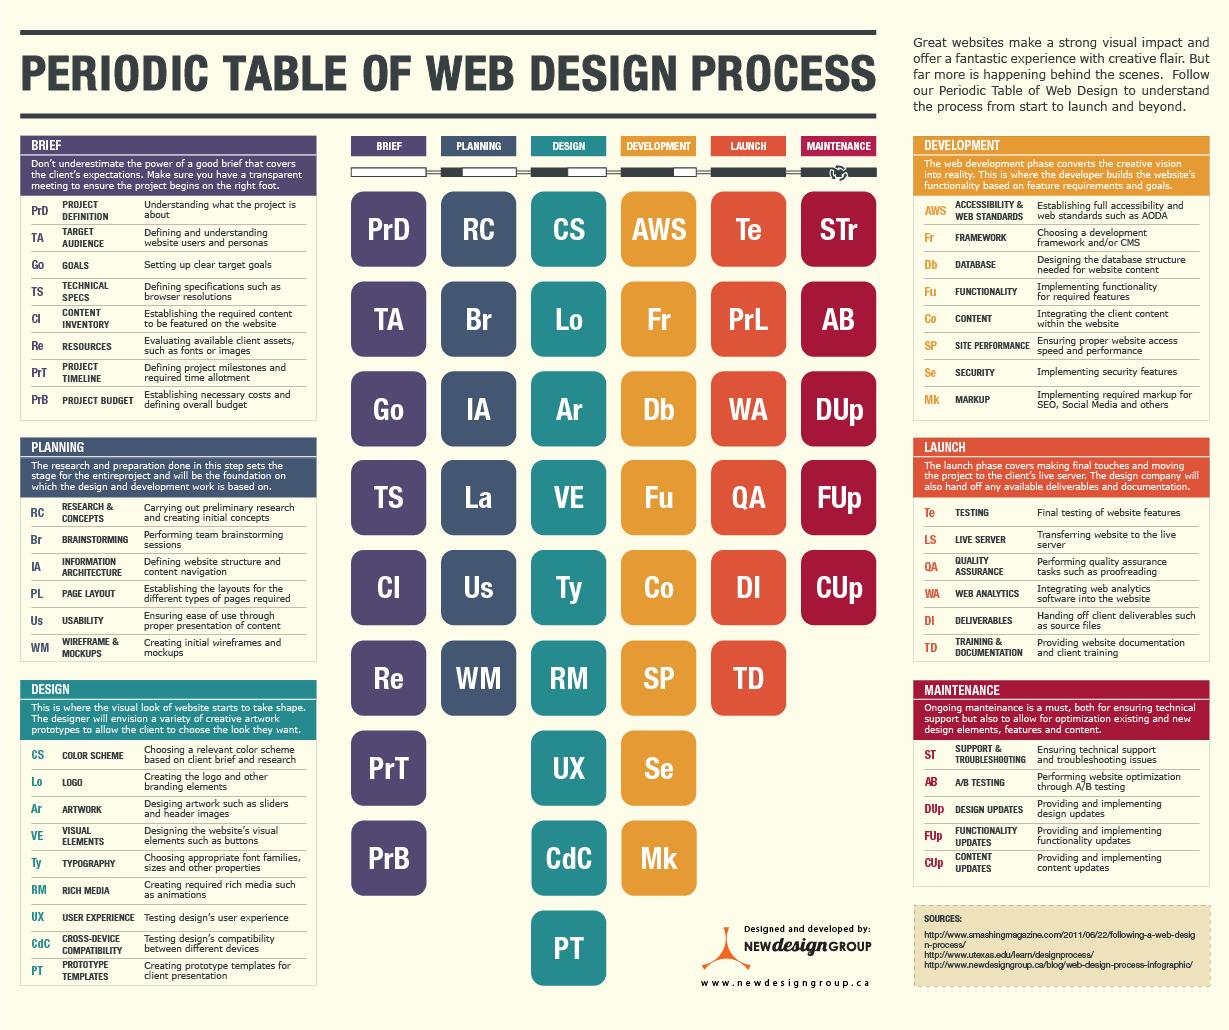 tabla-periodica-procesos-web